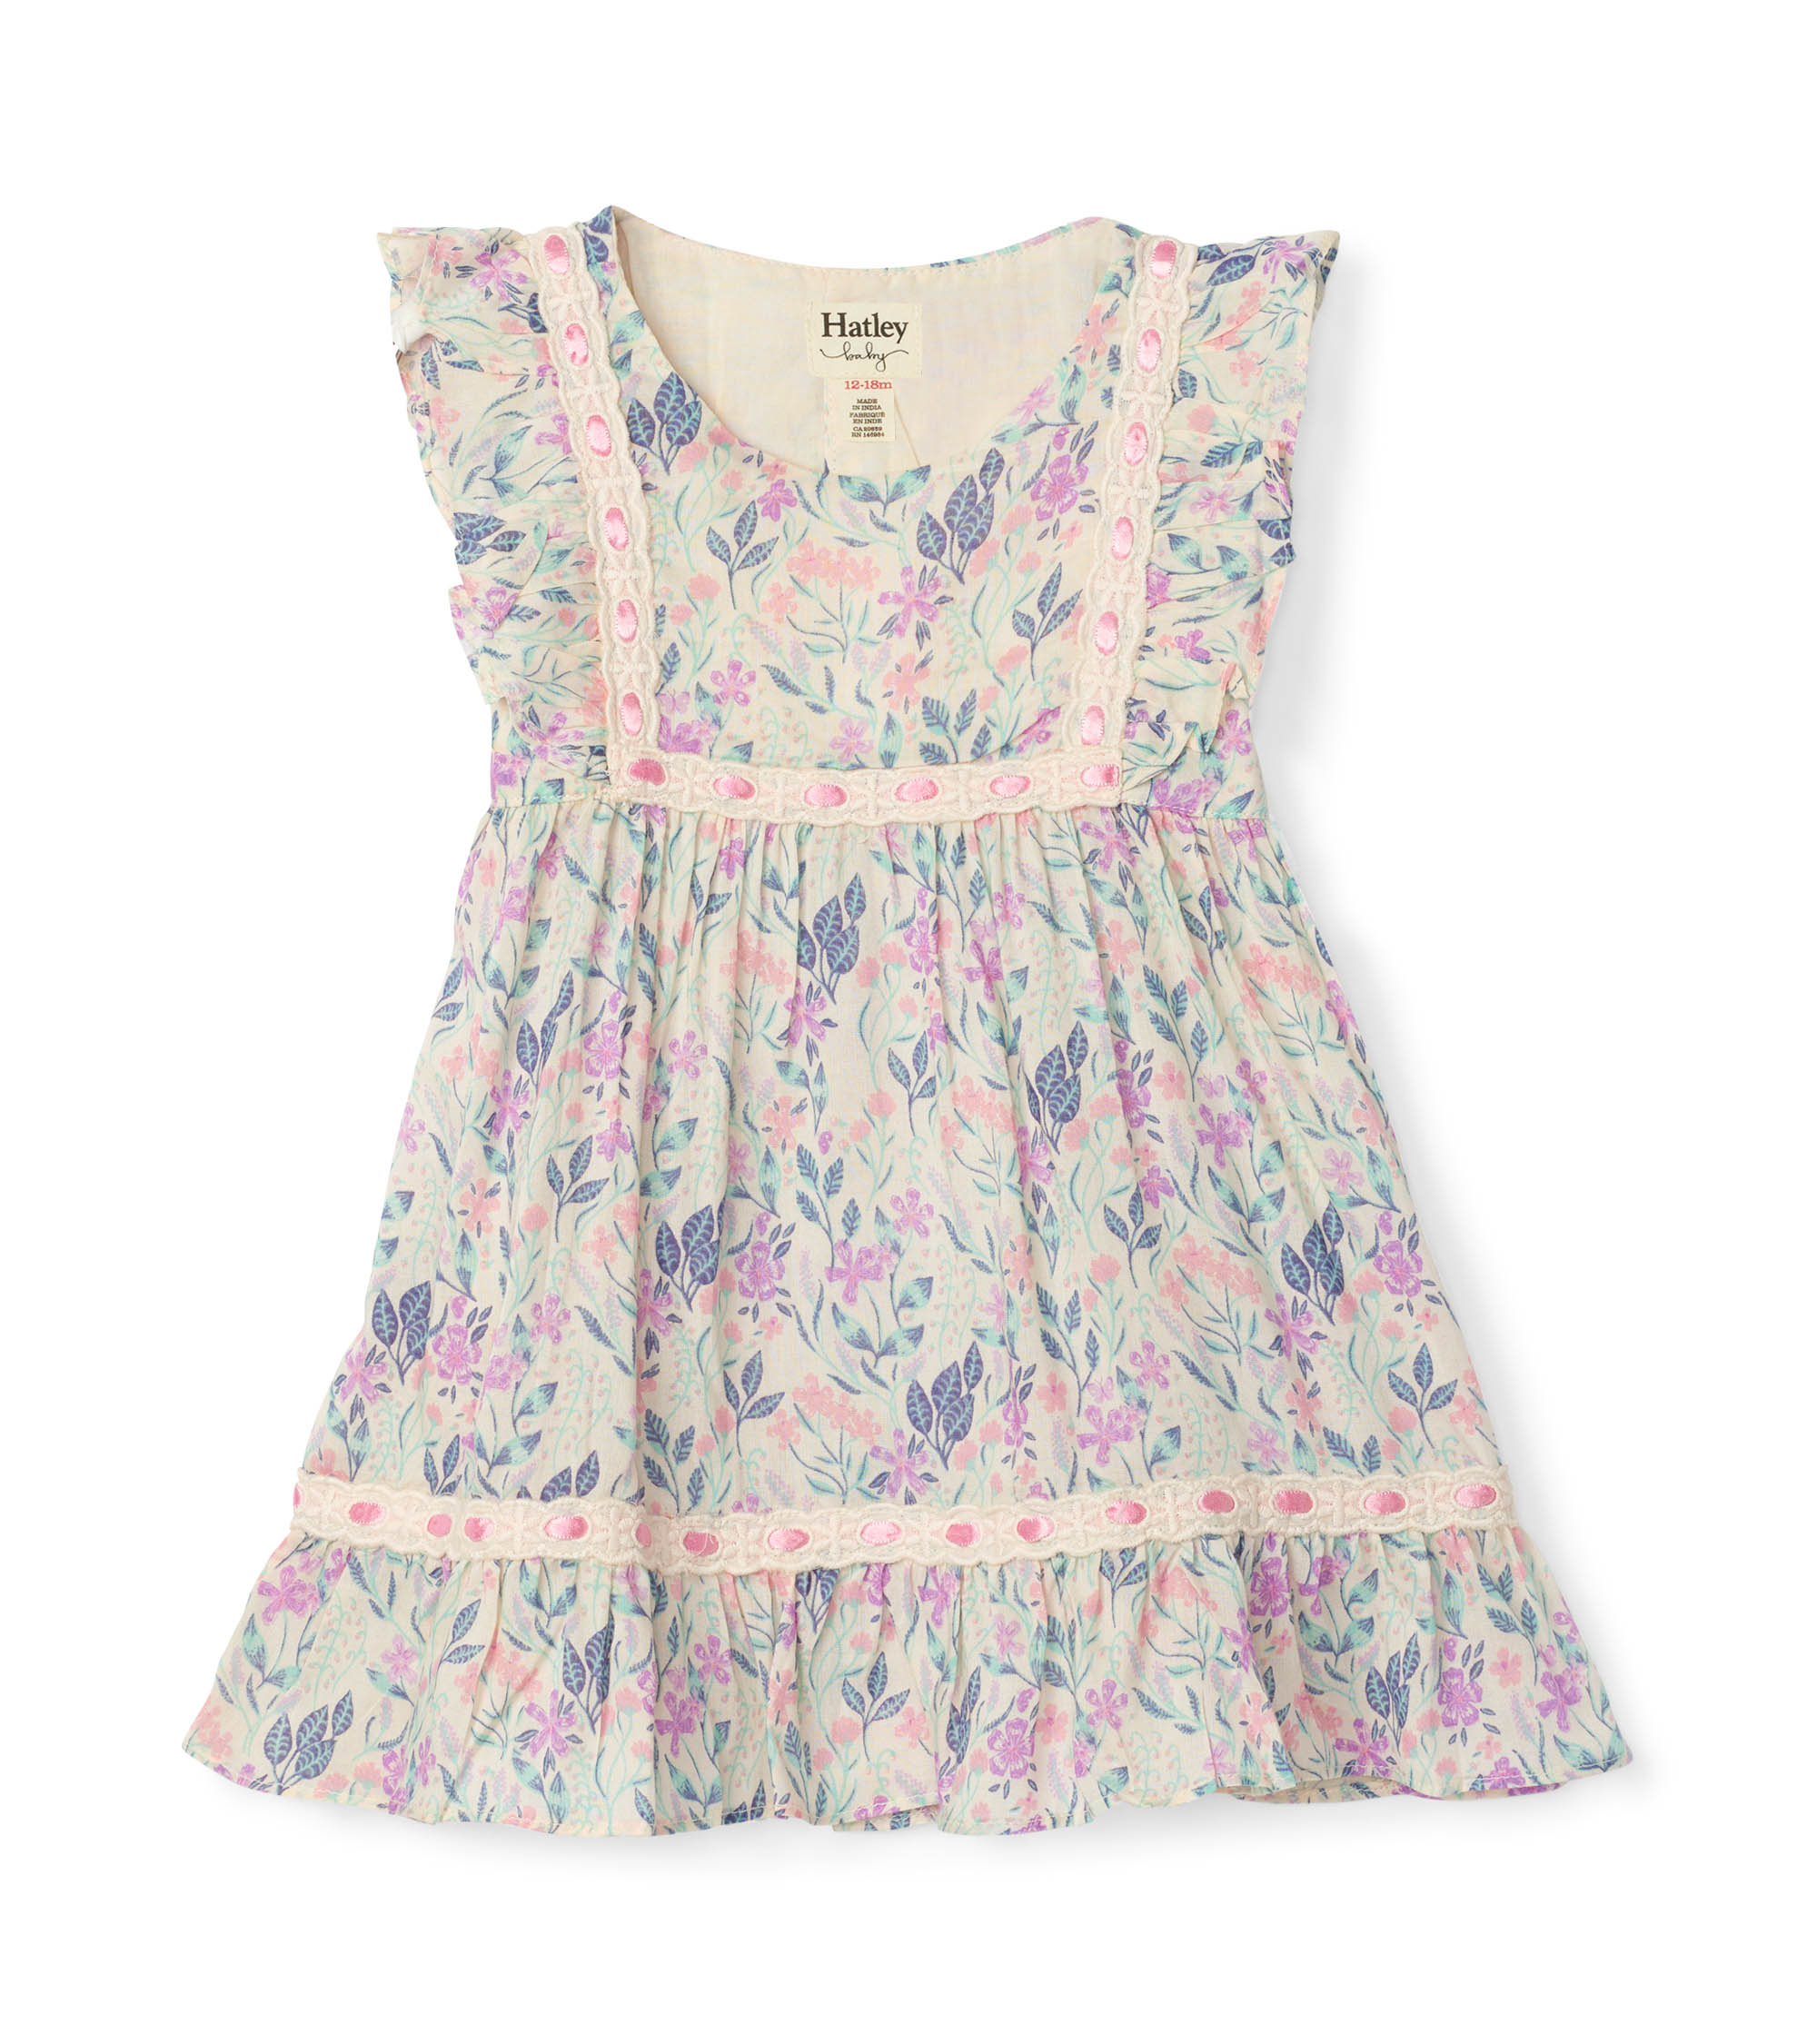 Hatley Baby Party Kleid - Flieder Blumen | Blue Flamingo ...